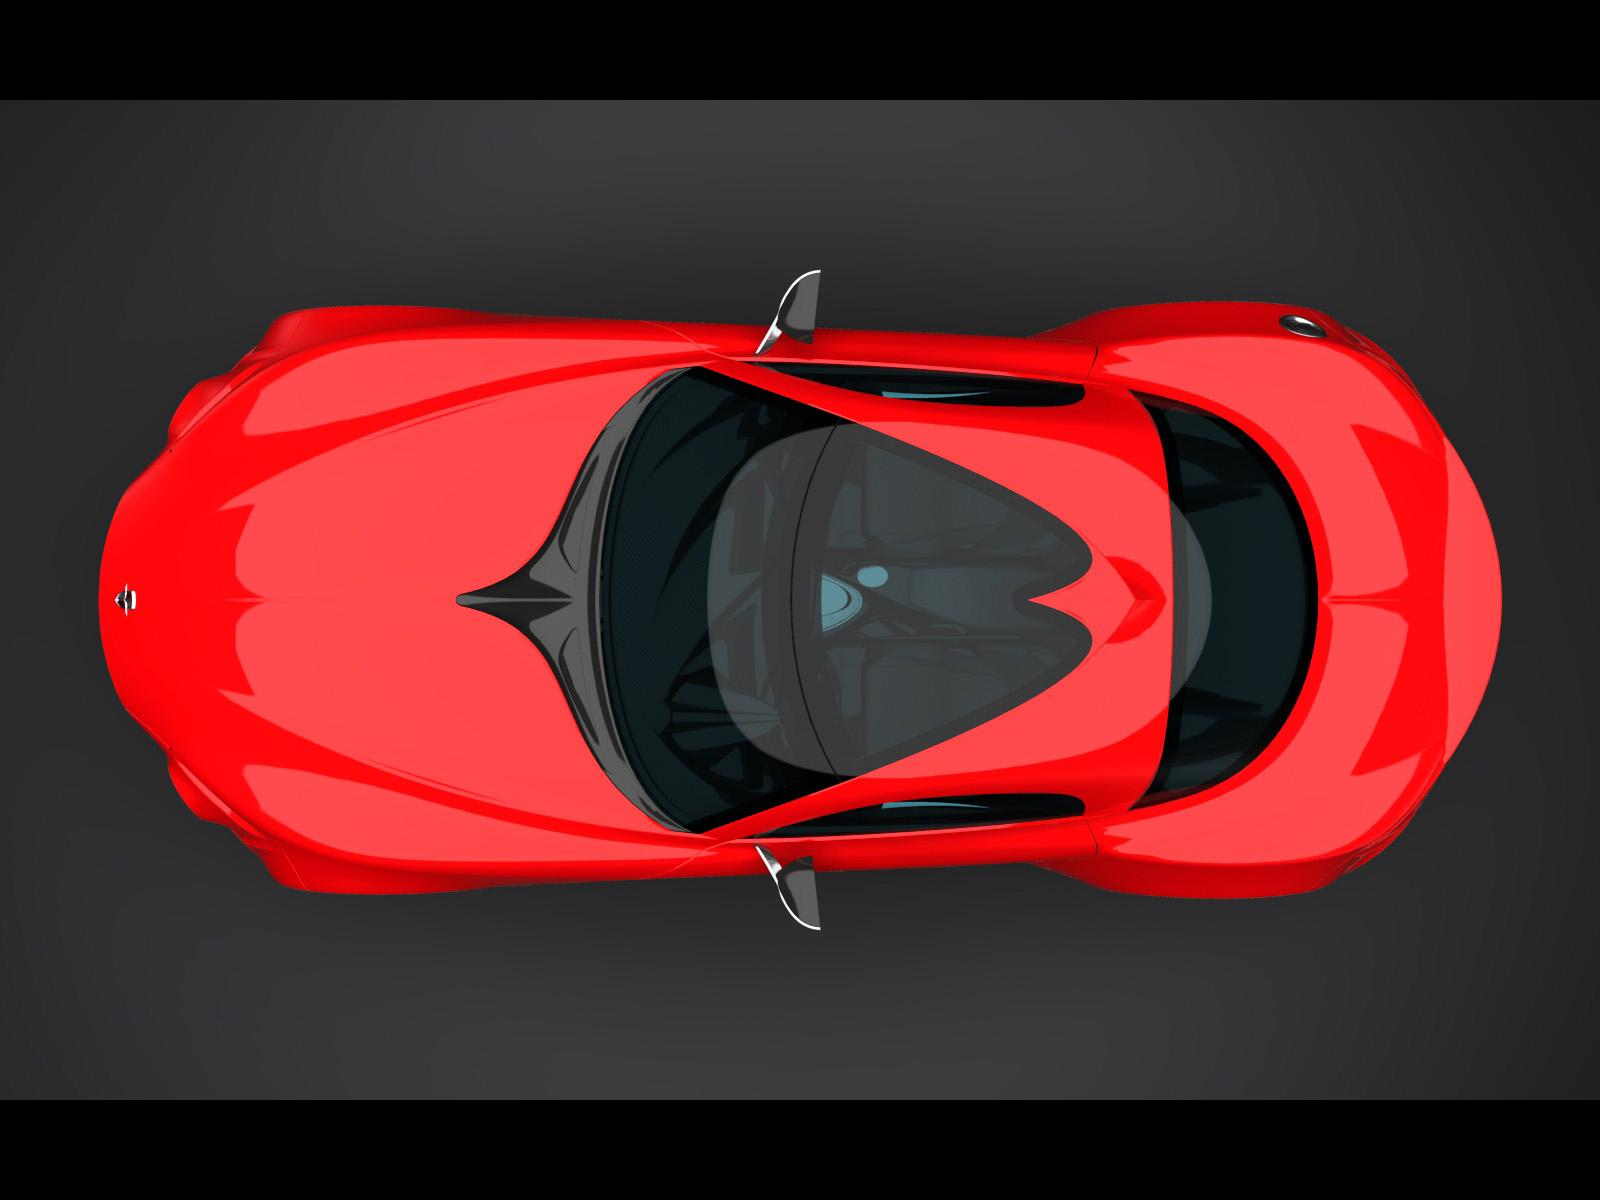 http://2.bp.blogspot.com/_viCh1SFyGrA/TOcvFi5bsCI/AAAAAAAAAGQ/GN6YbKtY4wQ/s1600/2010-Rossin-Bertin-Vorax-Coupe-Renderings-Red-Top-Side-1600x1200.jpg